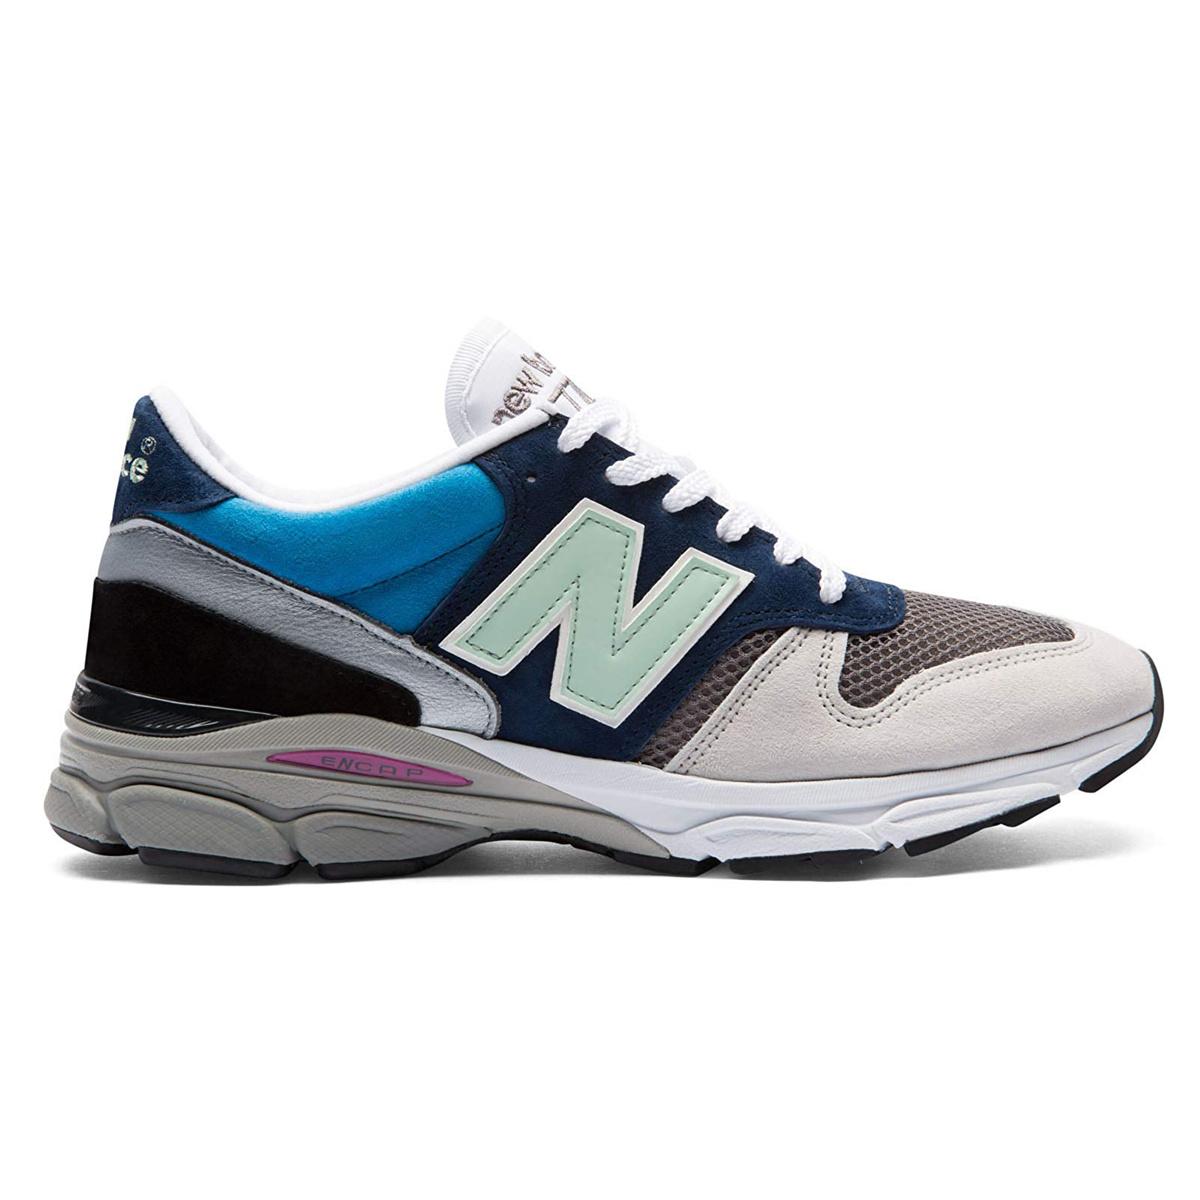 New Balance M7709FR 'Summer Nine' (White/Blue) - Made in England